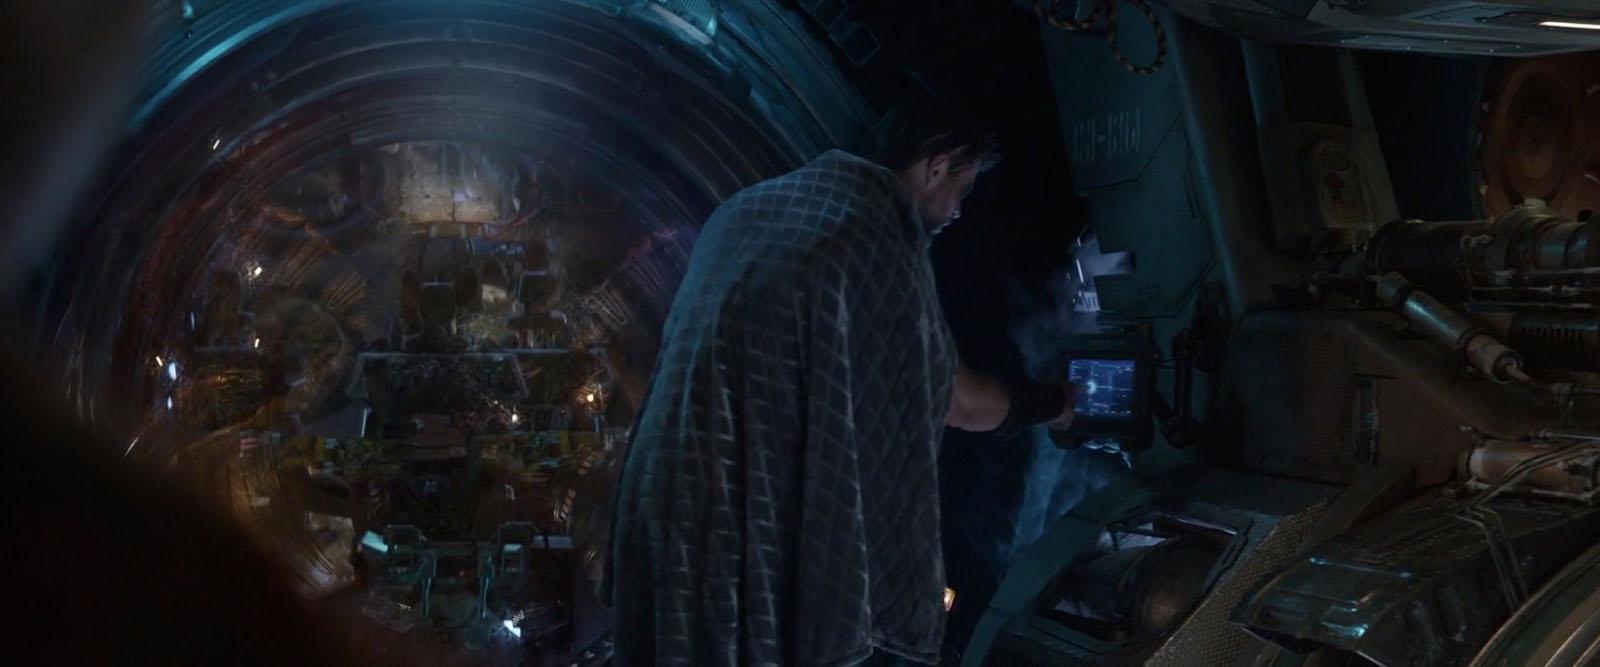 Avengers_IW_Screens_TerritoryStudio_005.jpg